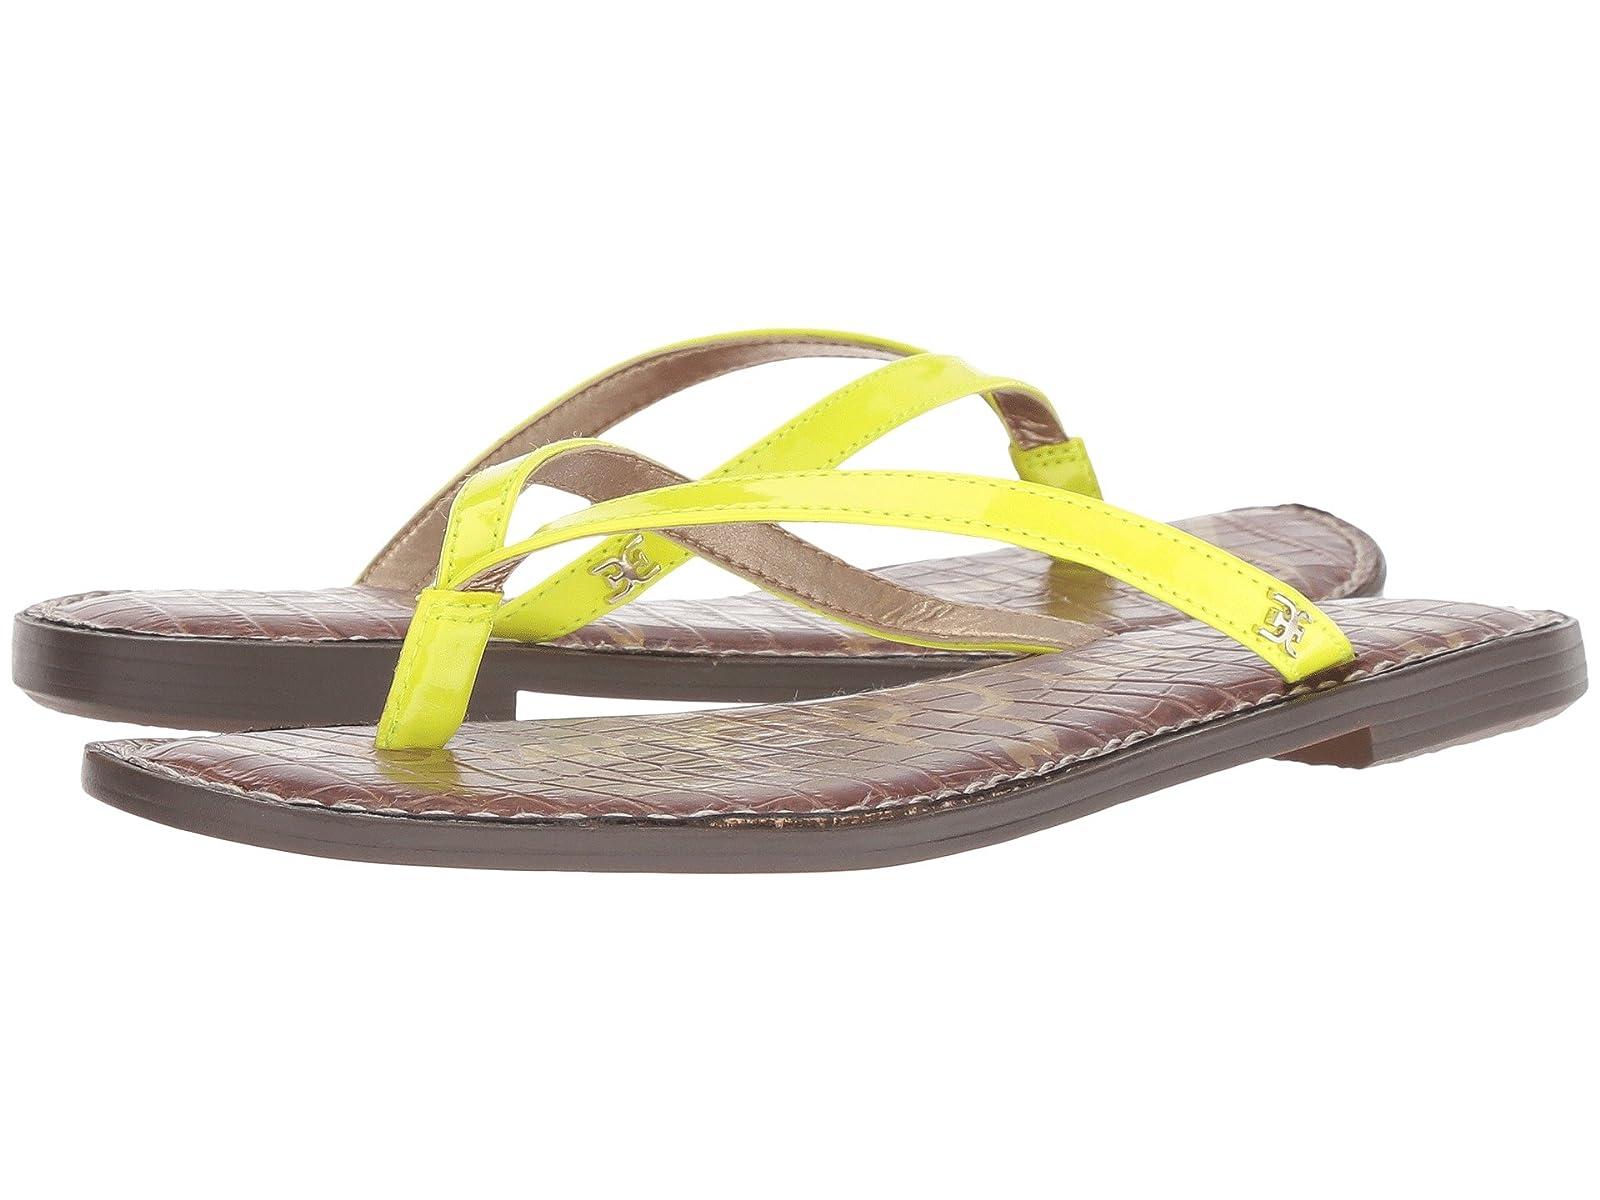 Sam Edelman GracieAtmospheric grades have affordable shoes